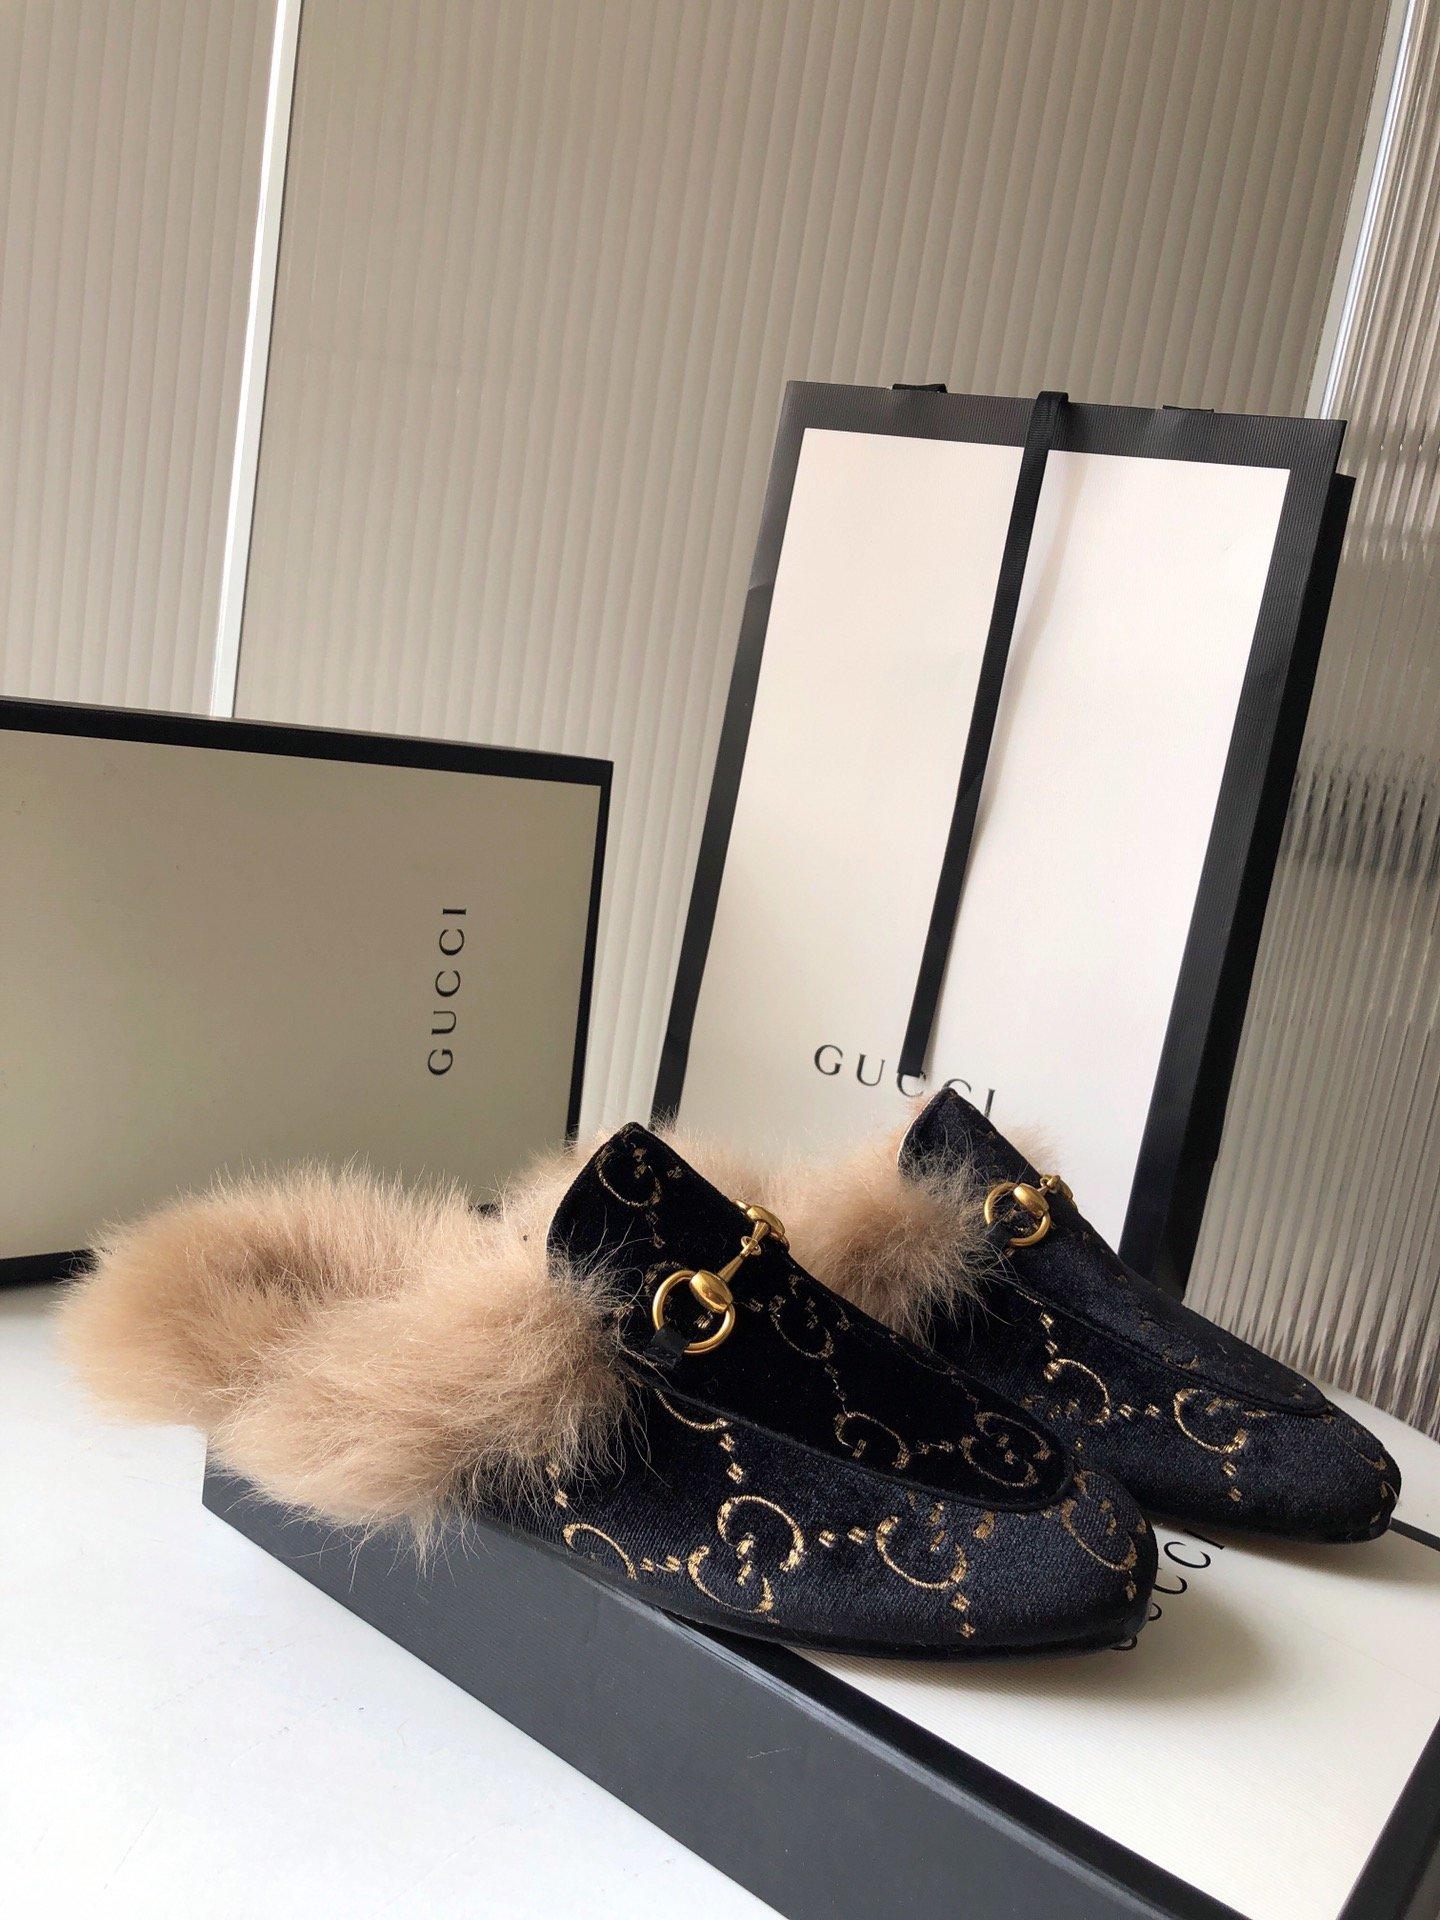 Gucci古奇 羔羊毛穆勒鞋双GG绣明星同款(图11)